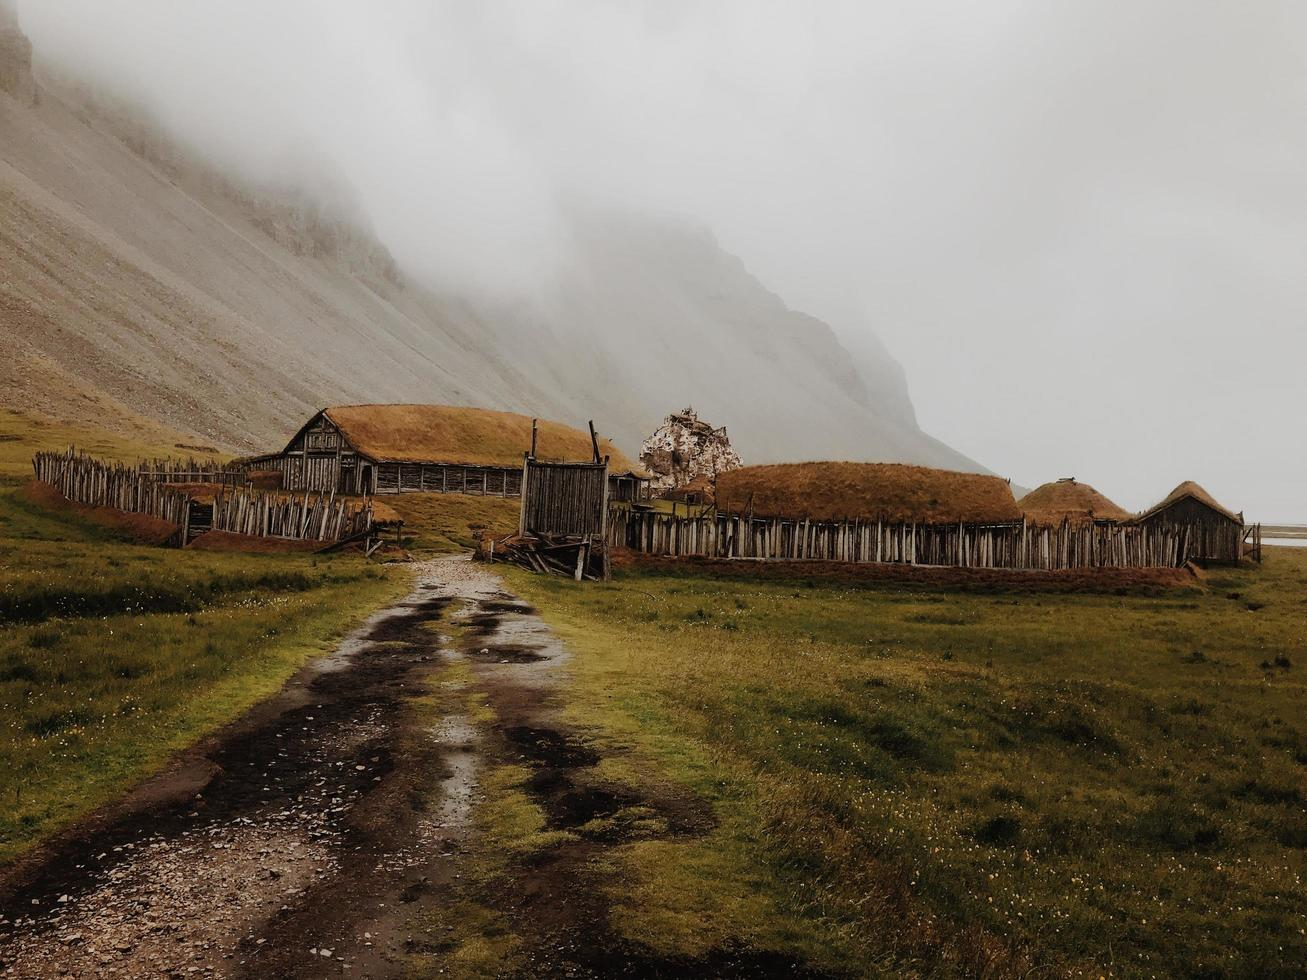 Hütte und Feldweg neben nebligen Berg foto